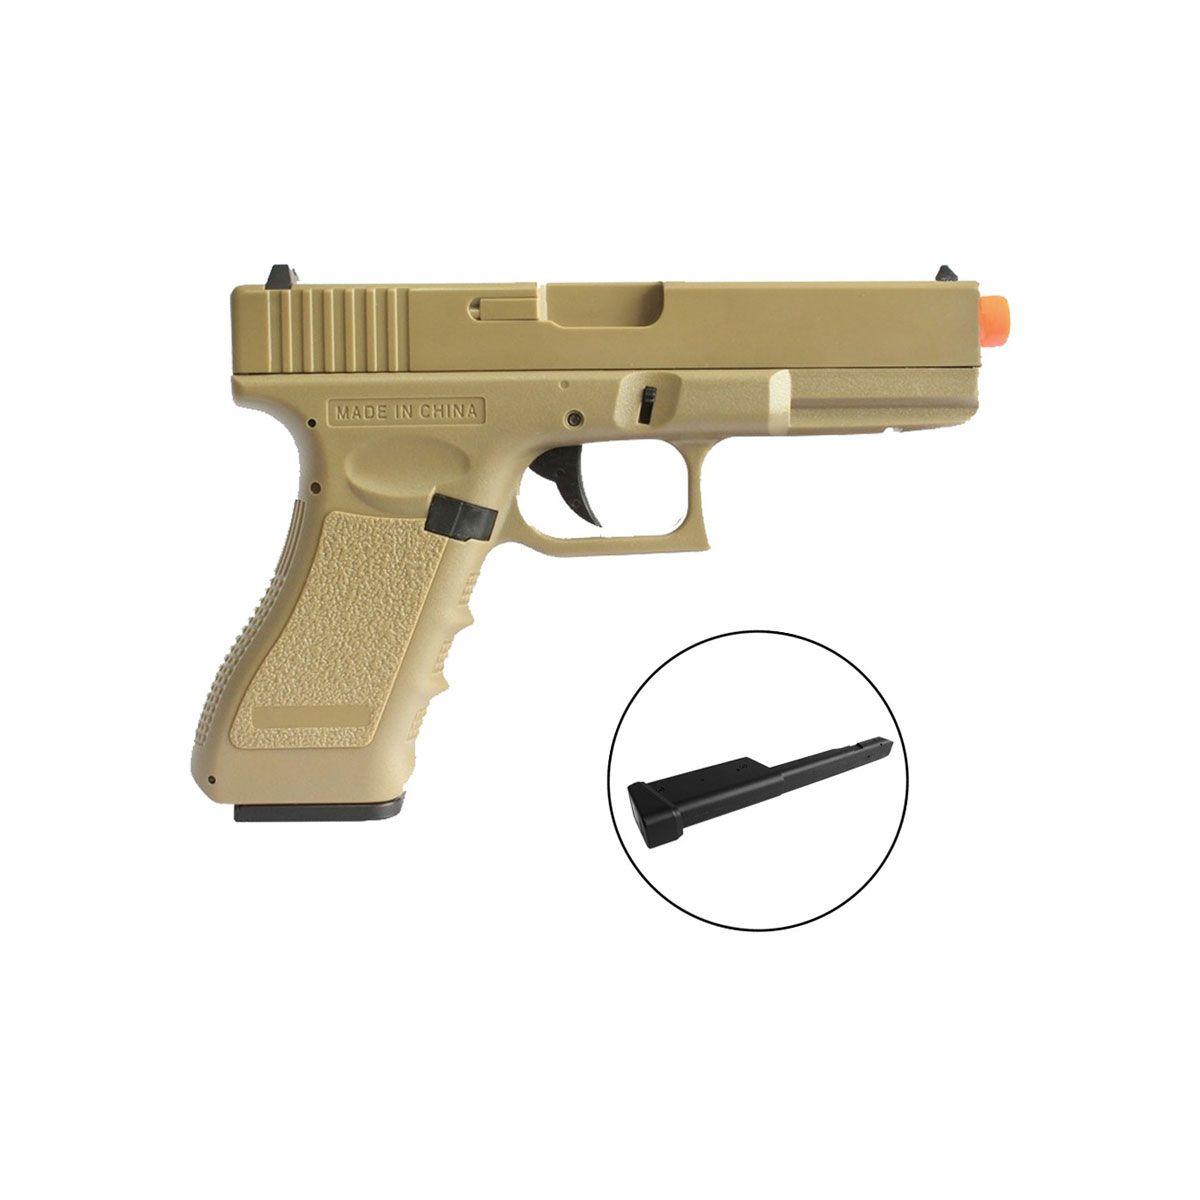 Pistola de Airsoft Glock G18 Cm 030 Tan + Magazine Estendido (combo)